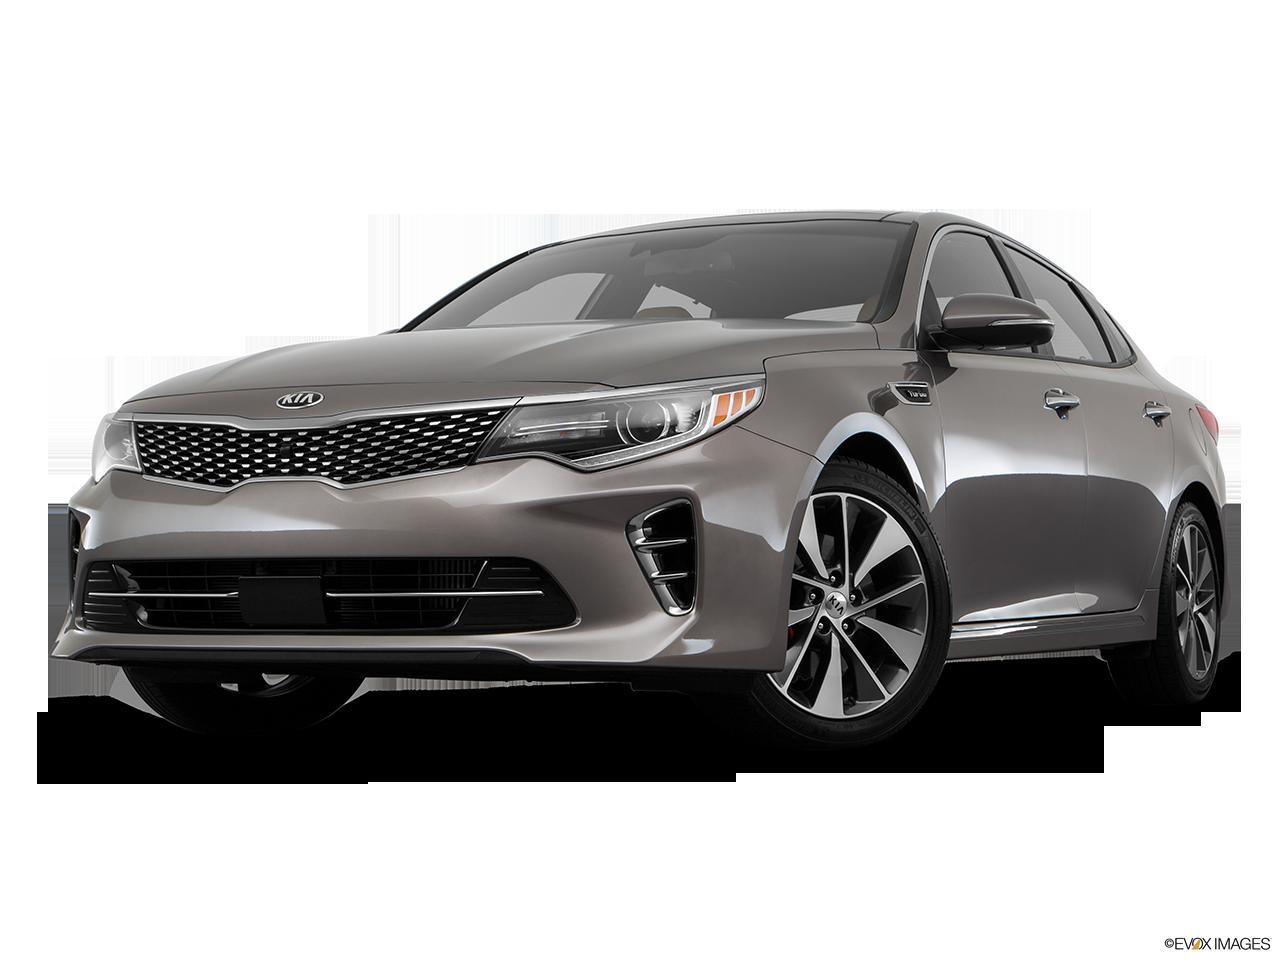 Test Drive A 2017 Kia Optima at Galpin Kia in Los Angeles